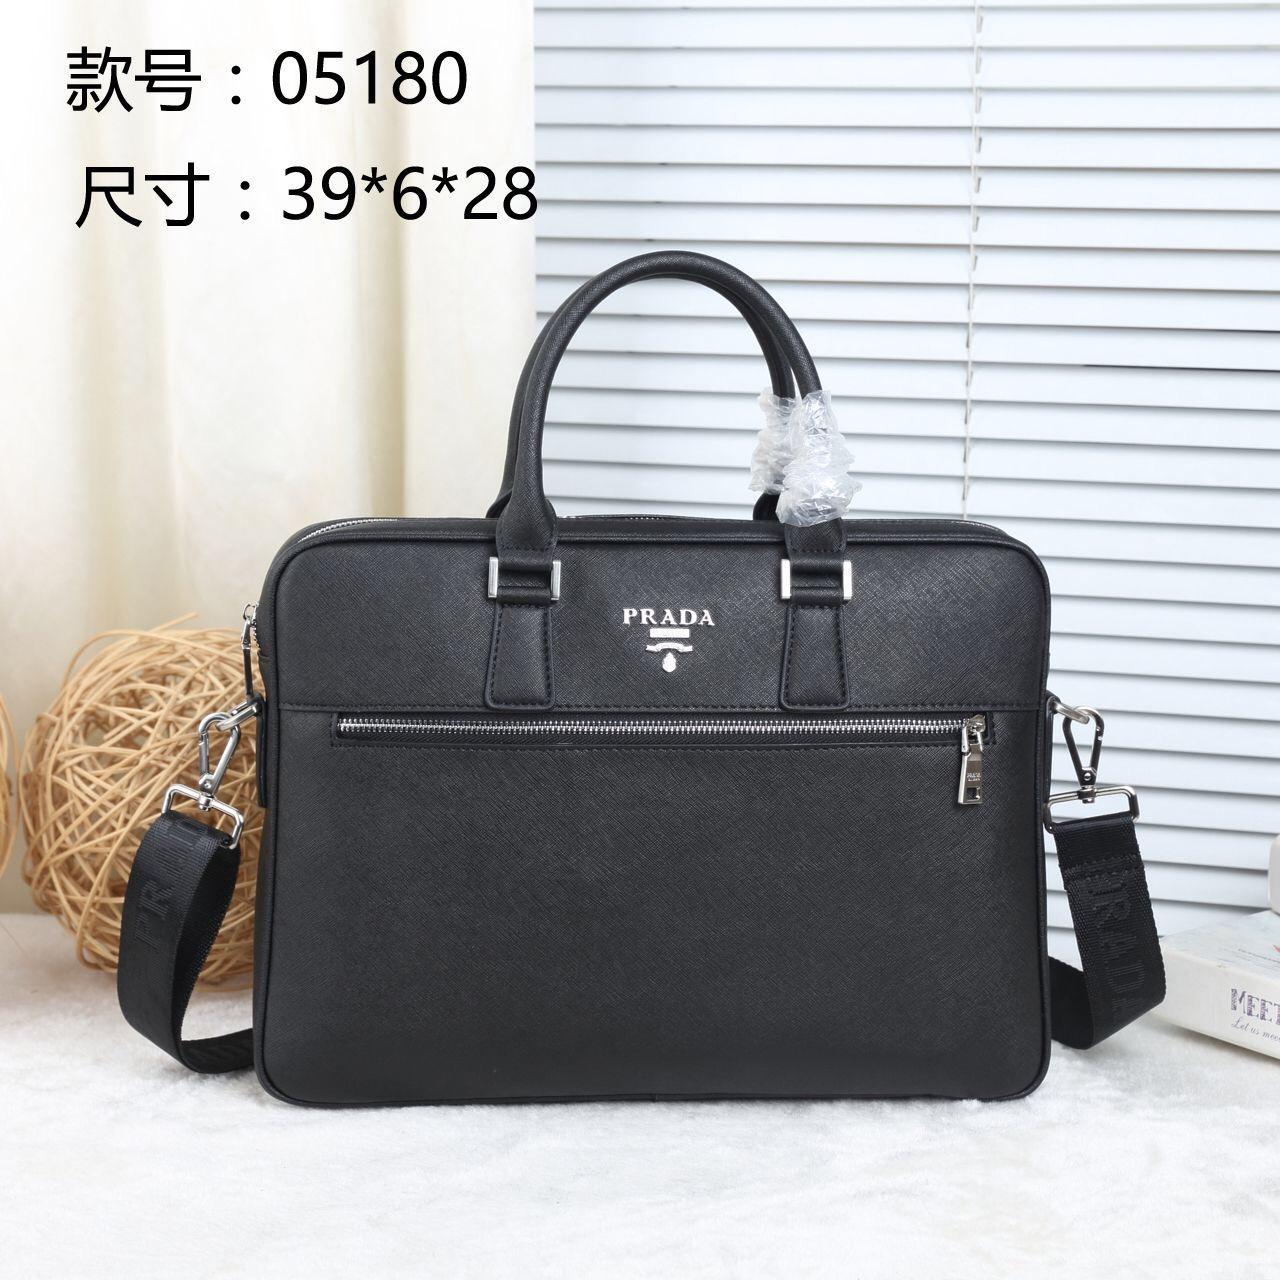 f8ed05152b61 Famous Brand Business Men Briefcase Bag Man Shoulder Bag Luxury ...